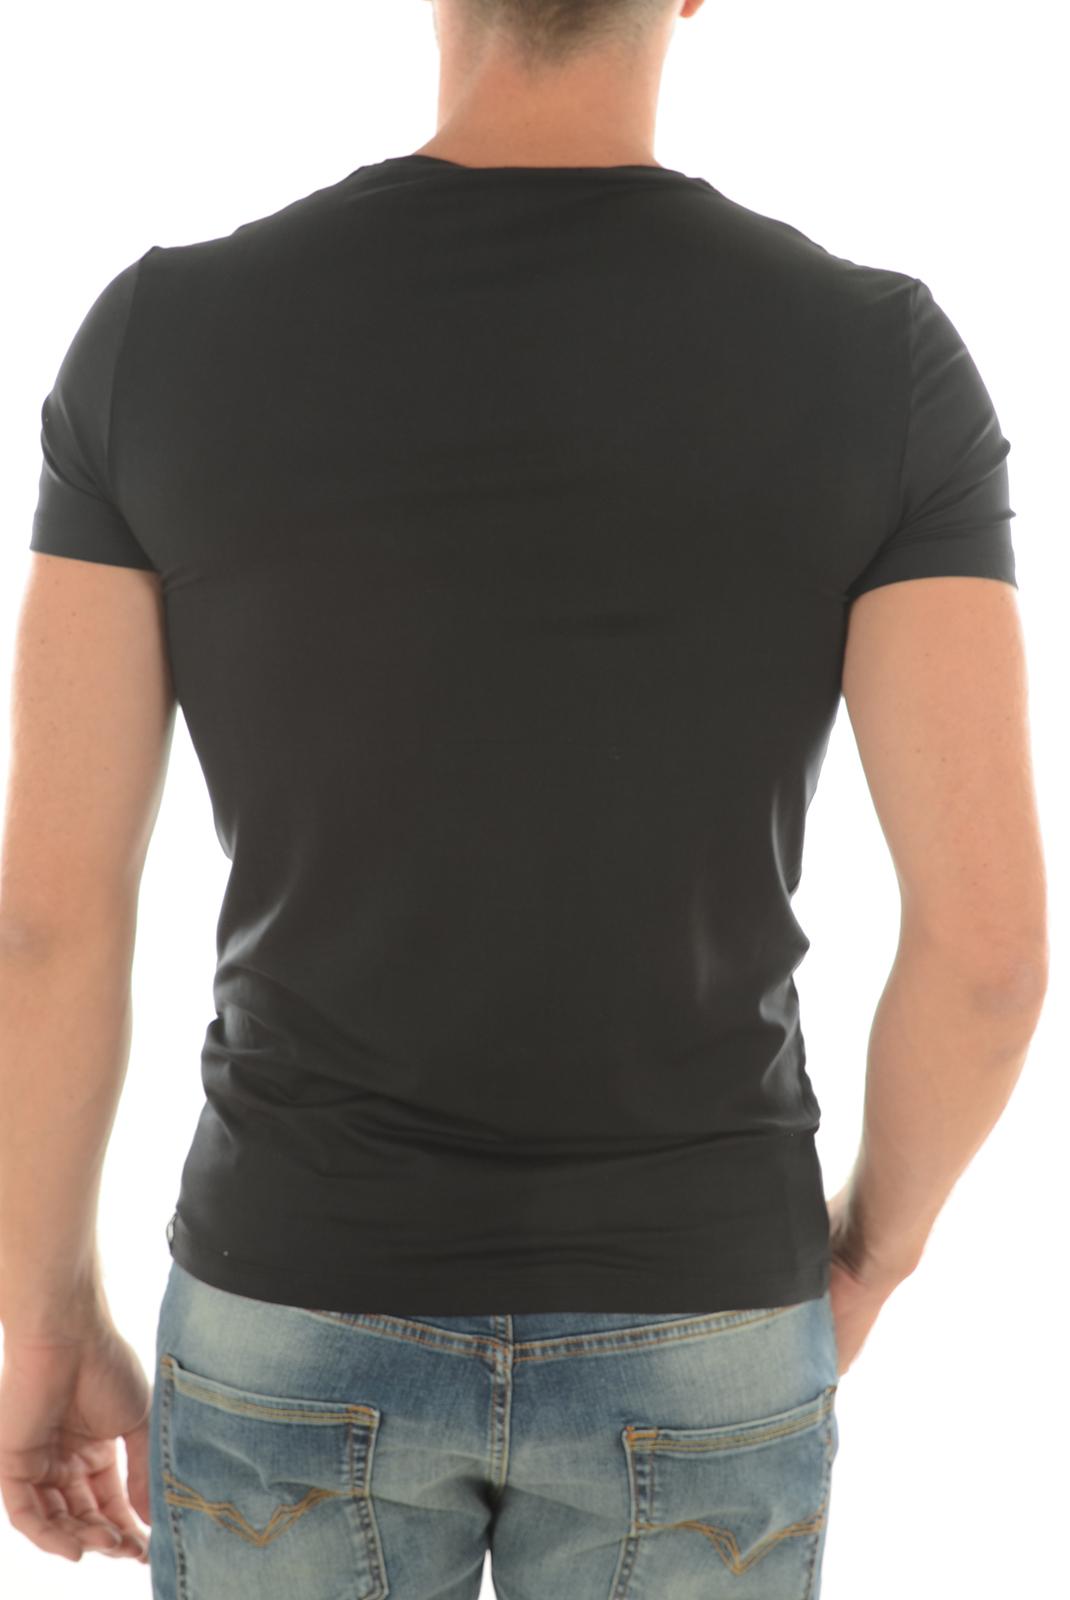 Tee-shirts  Guess jeans U64M22LYO11 A996 NOIR